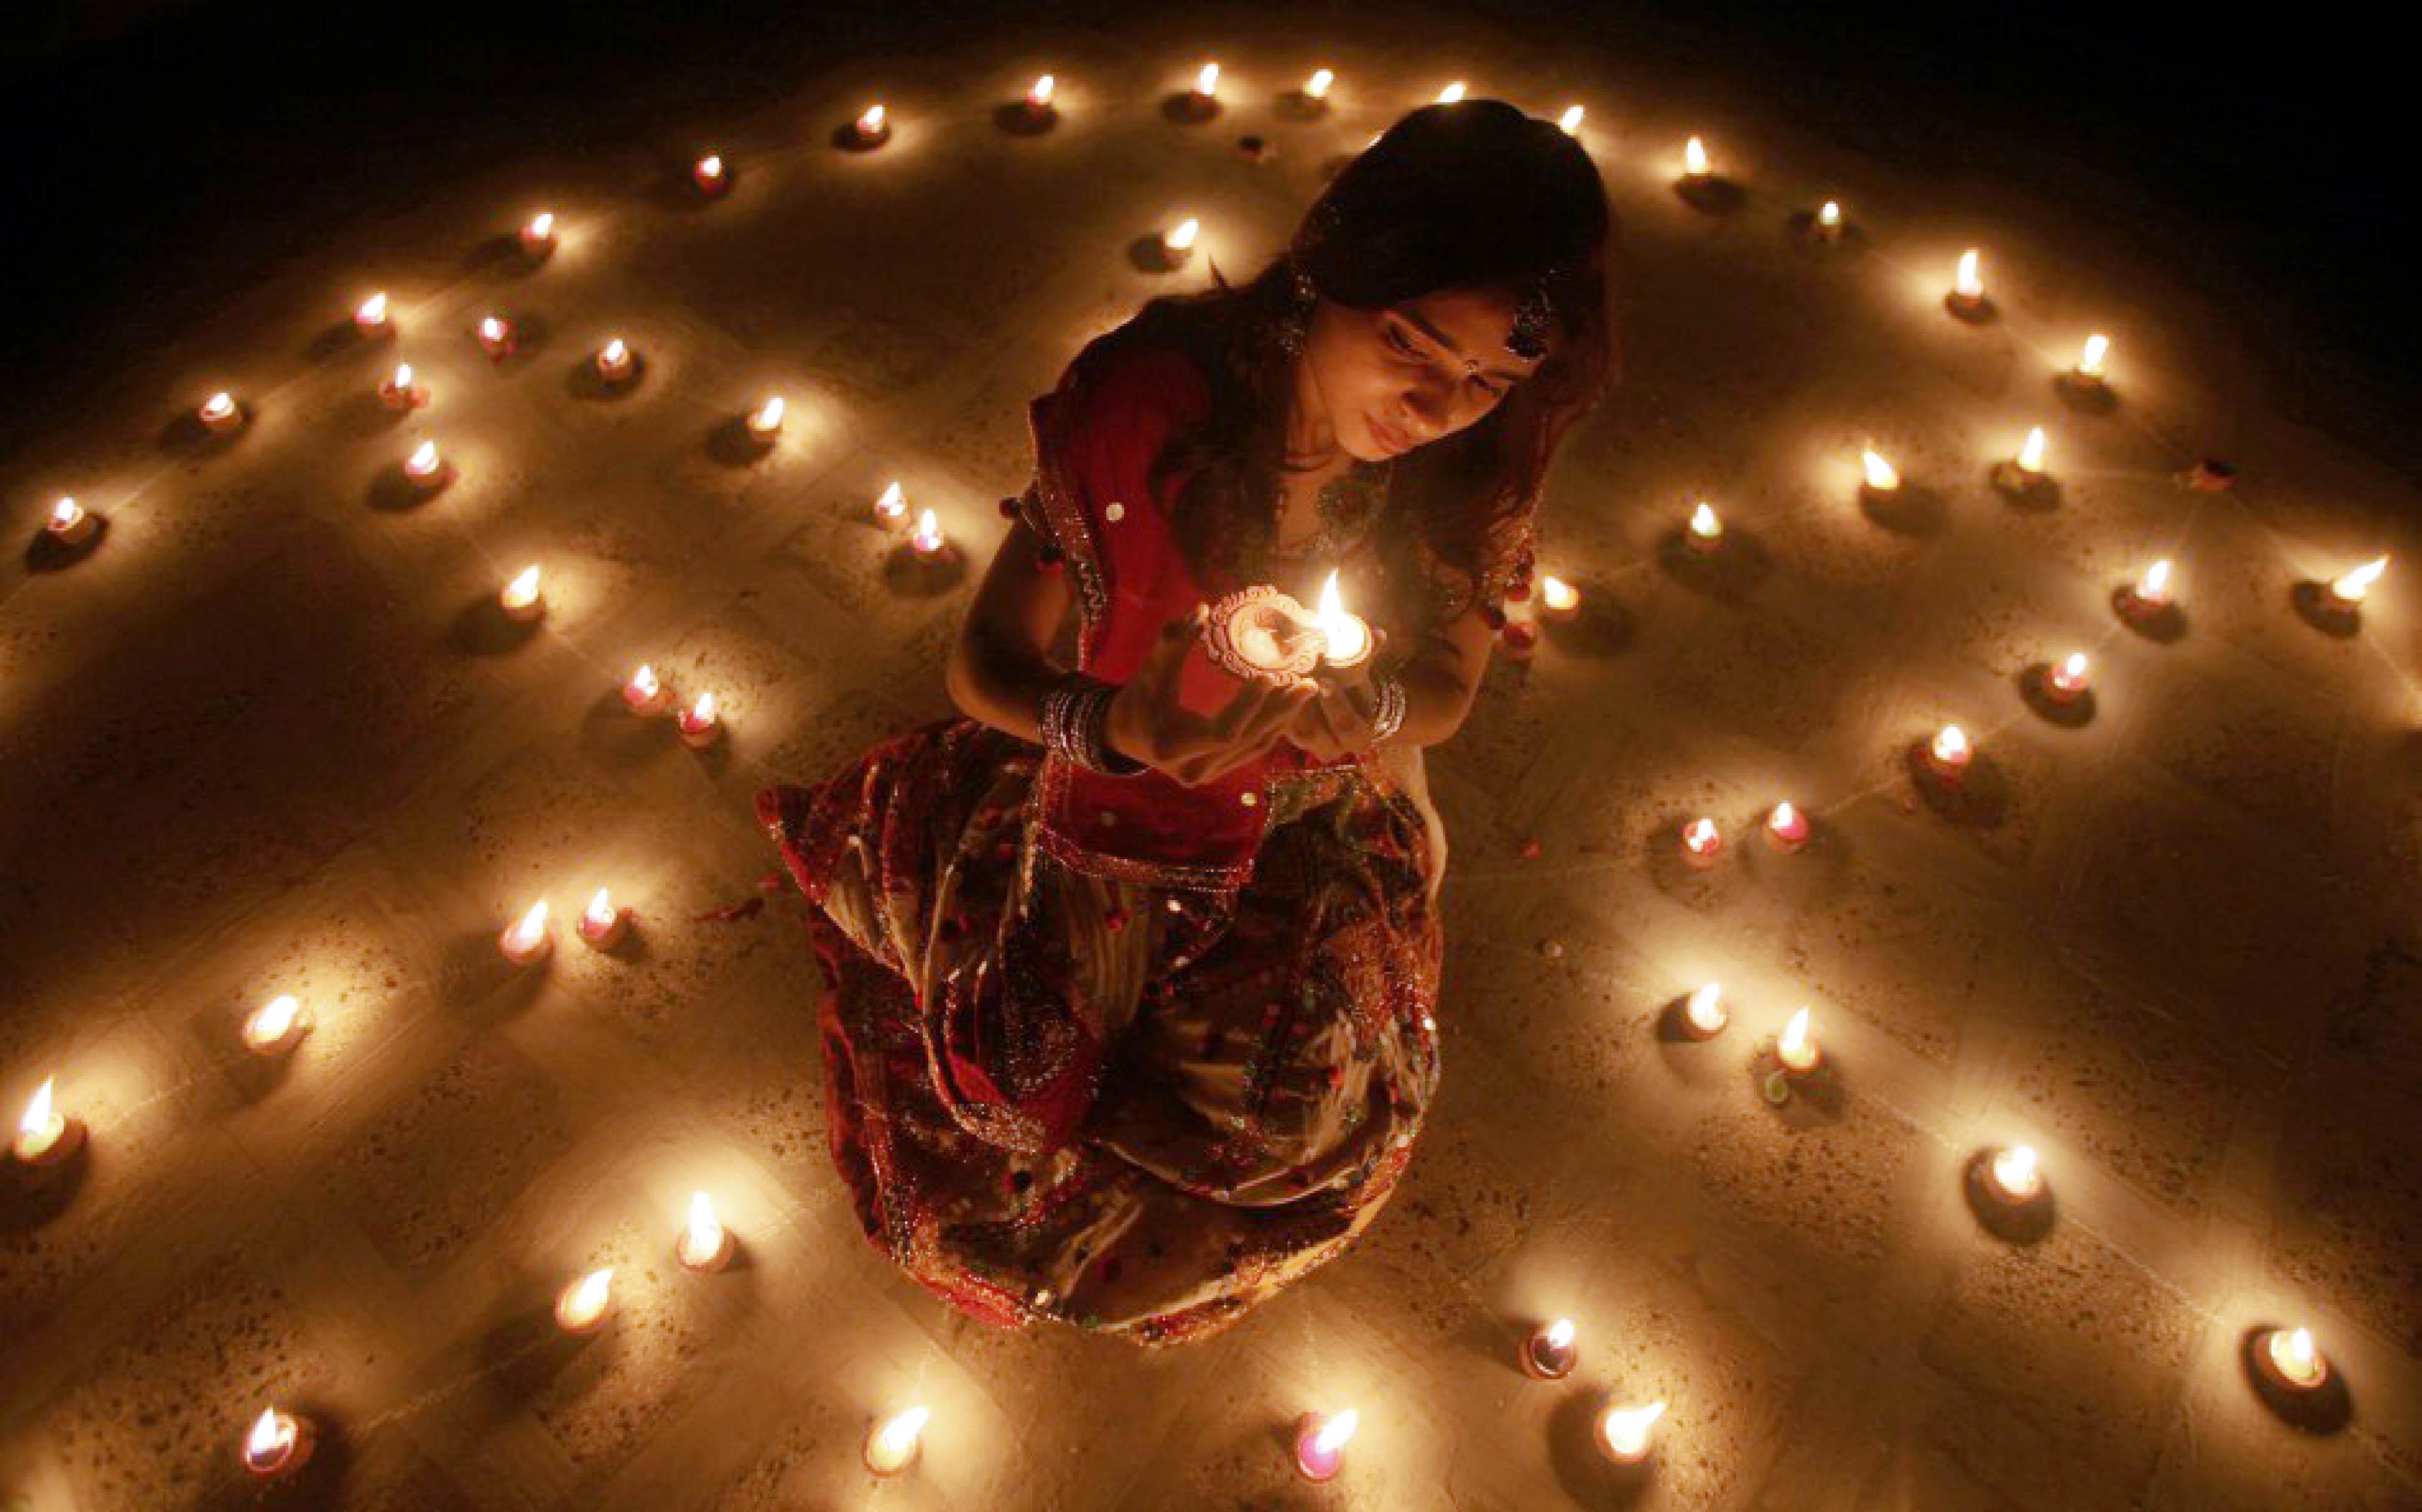 Round, Daughters, Come Again, Nupur Gautam, Haryana